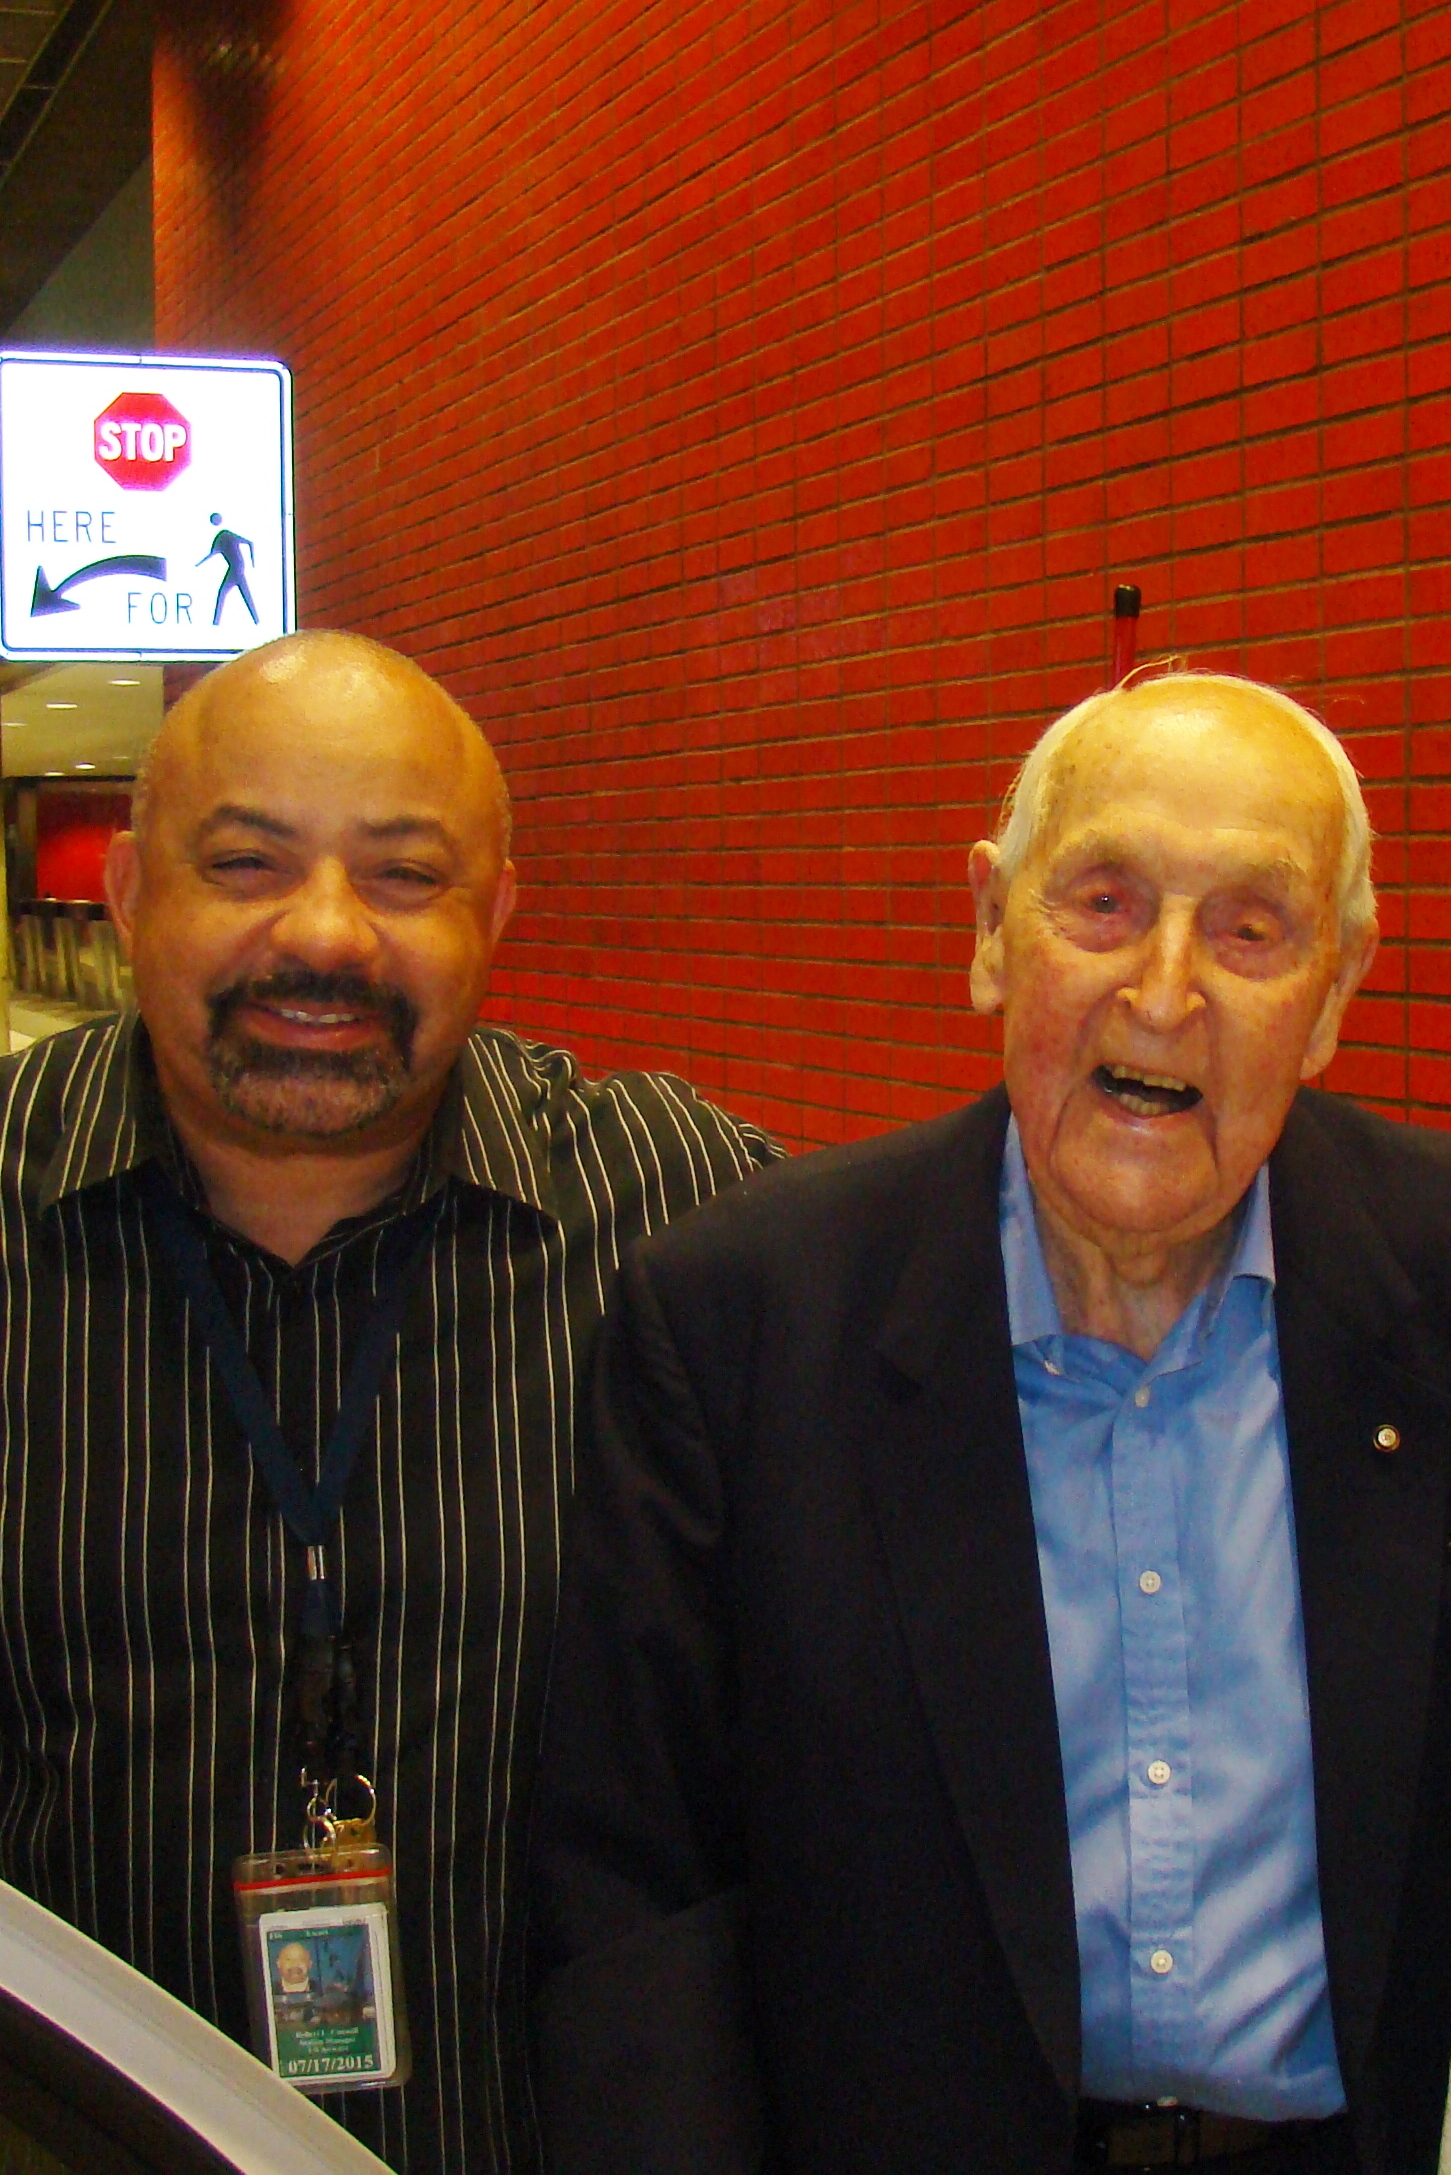 Robert Conwell & Sir Lenox, 16 Nov '13.JPG